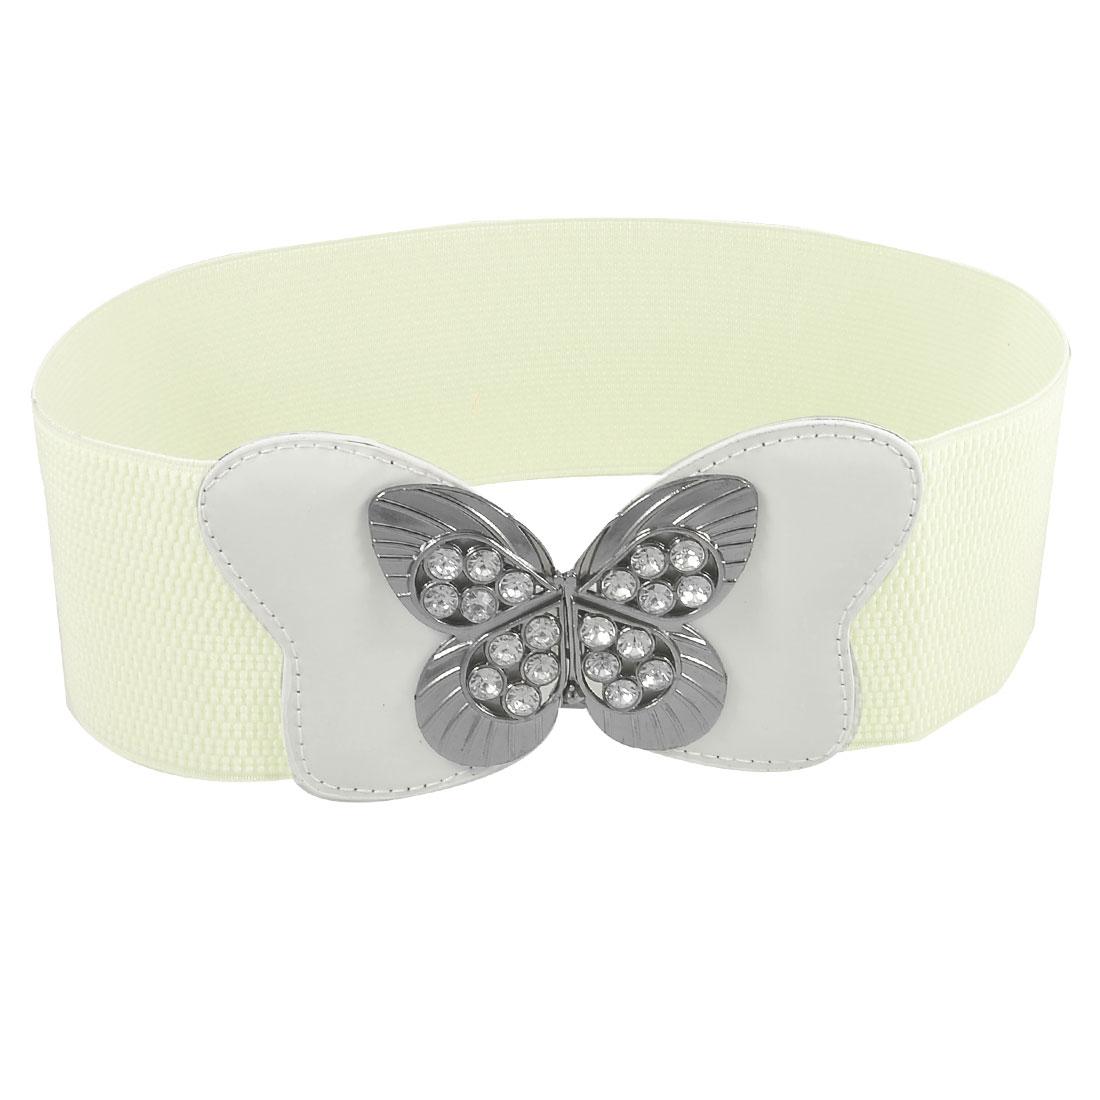 Women Hollow Butterfly Buckle Rhinestone Inlaid White Stretchy Waist Belt